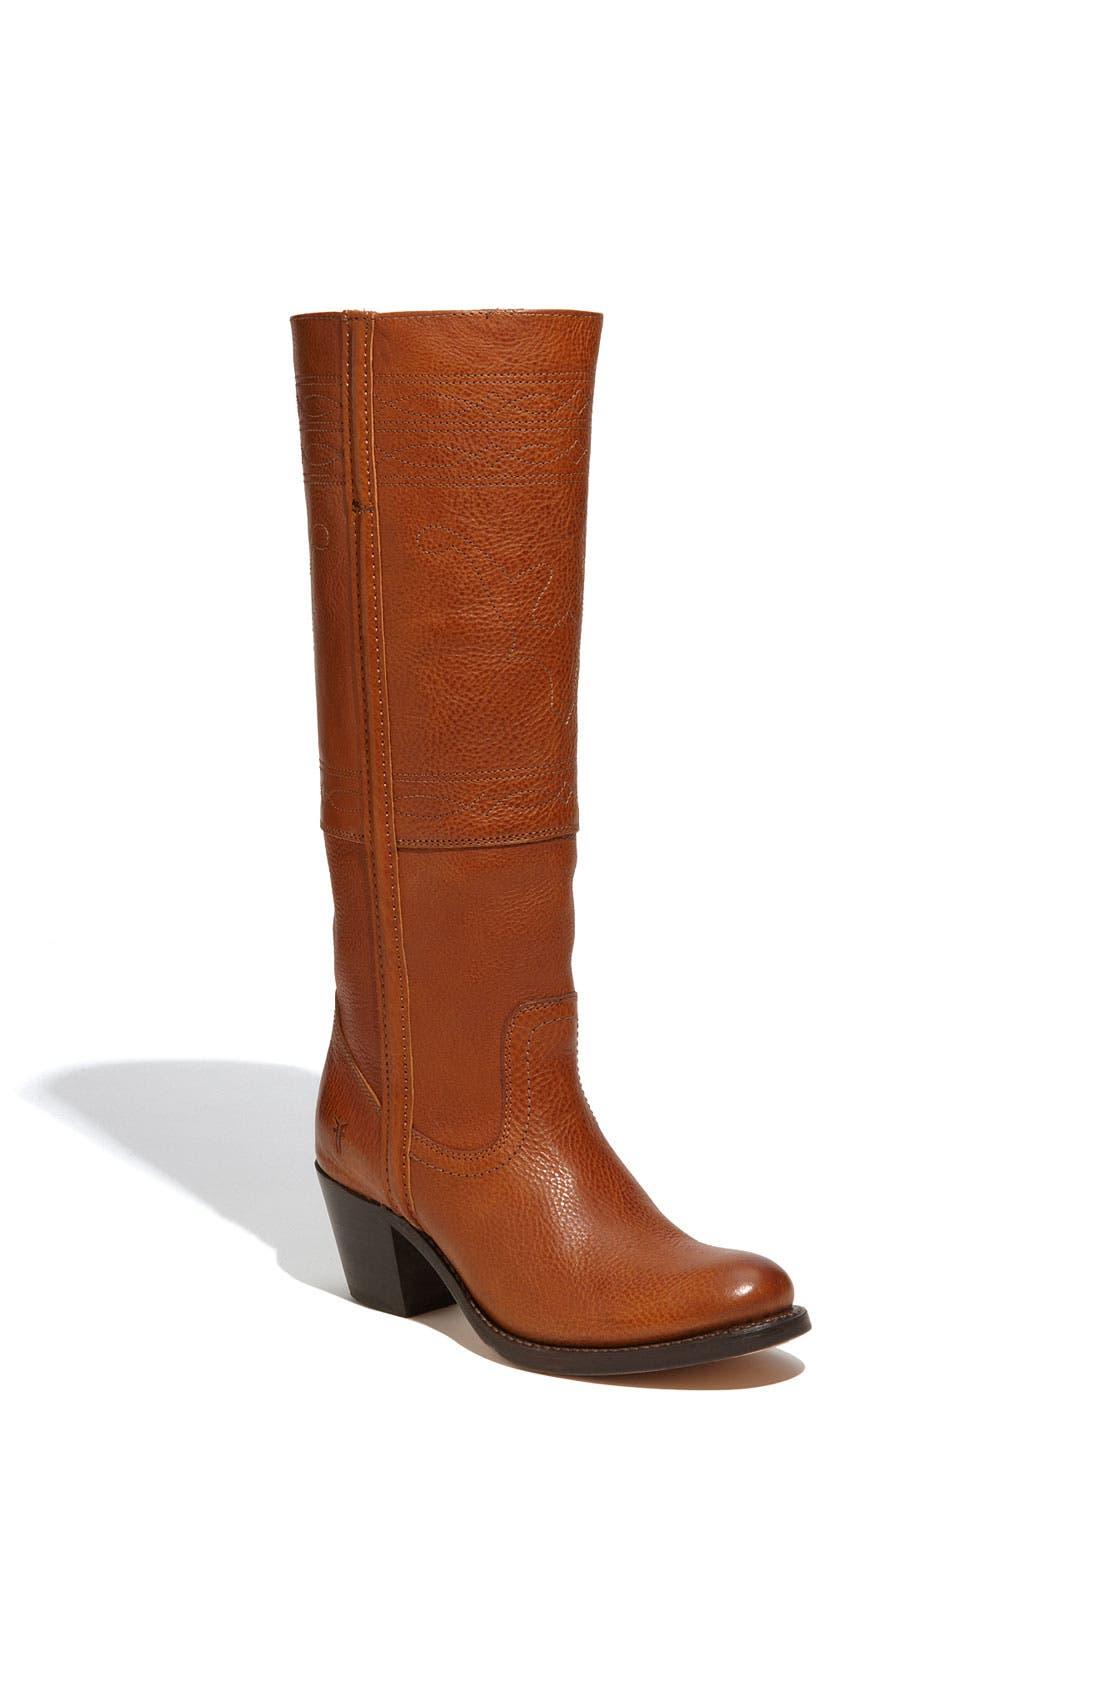 Alternate Image 1 Selected - Frye 'Jane Stitching Horse' Boot